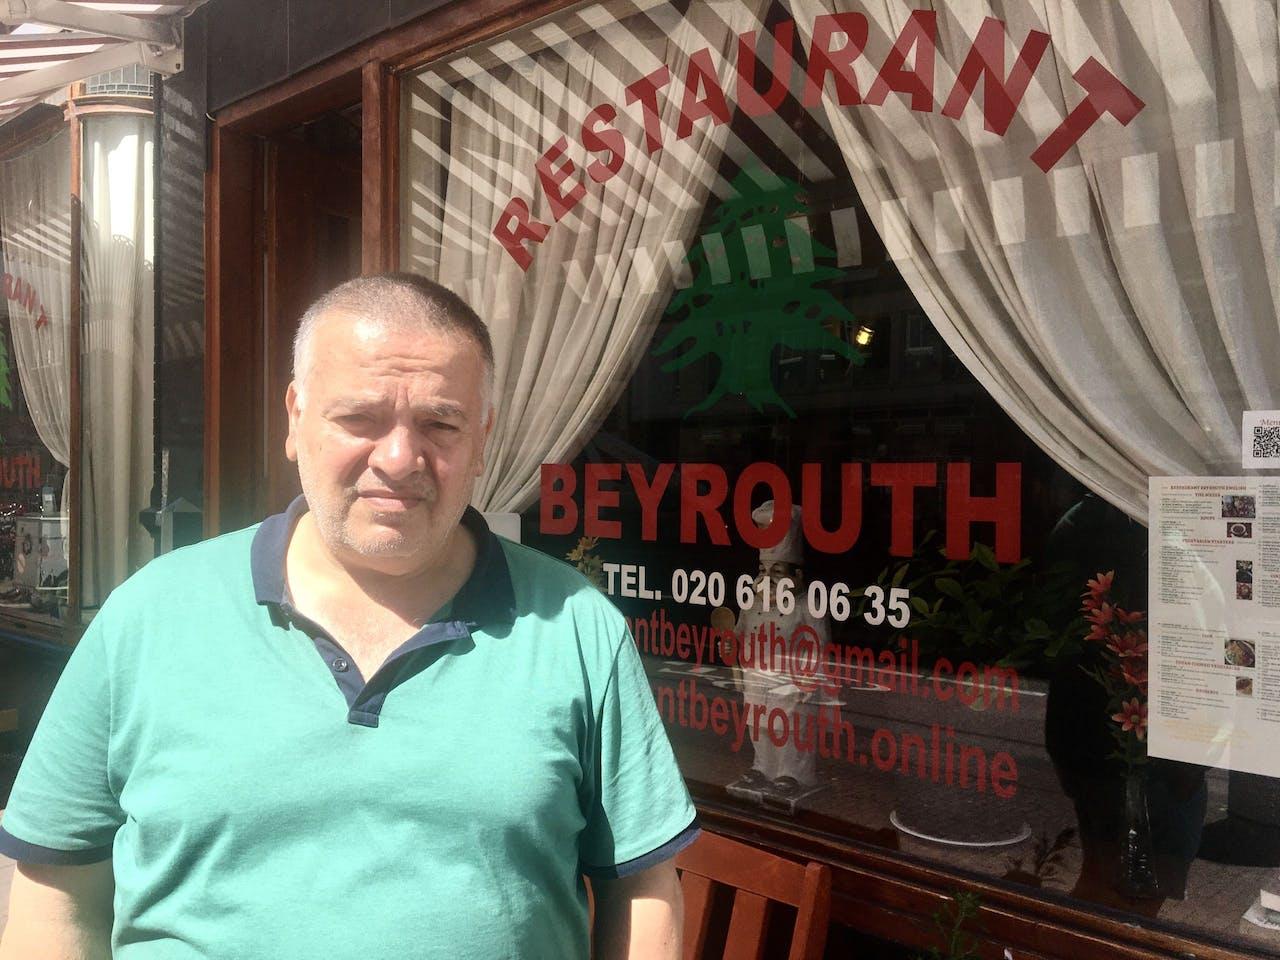 Uitbater van restaurant Beyrouth Kamal Estephan